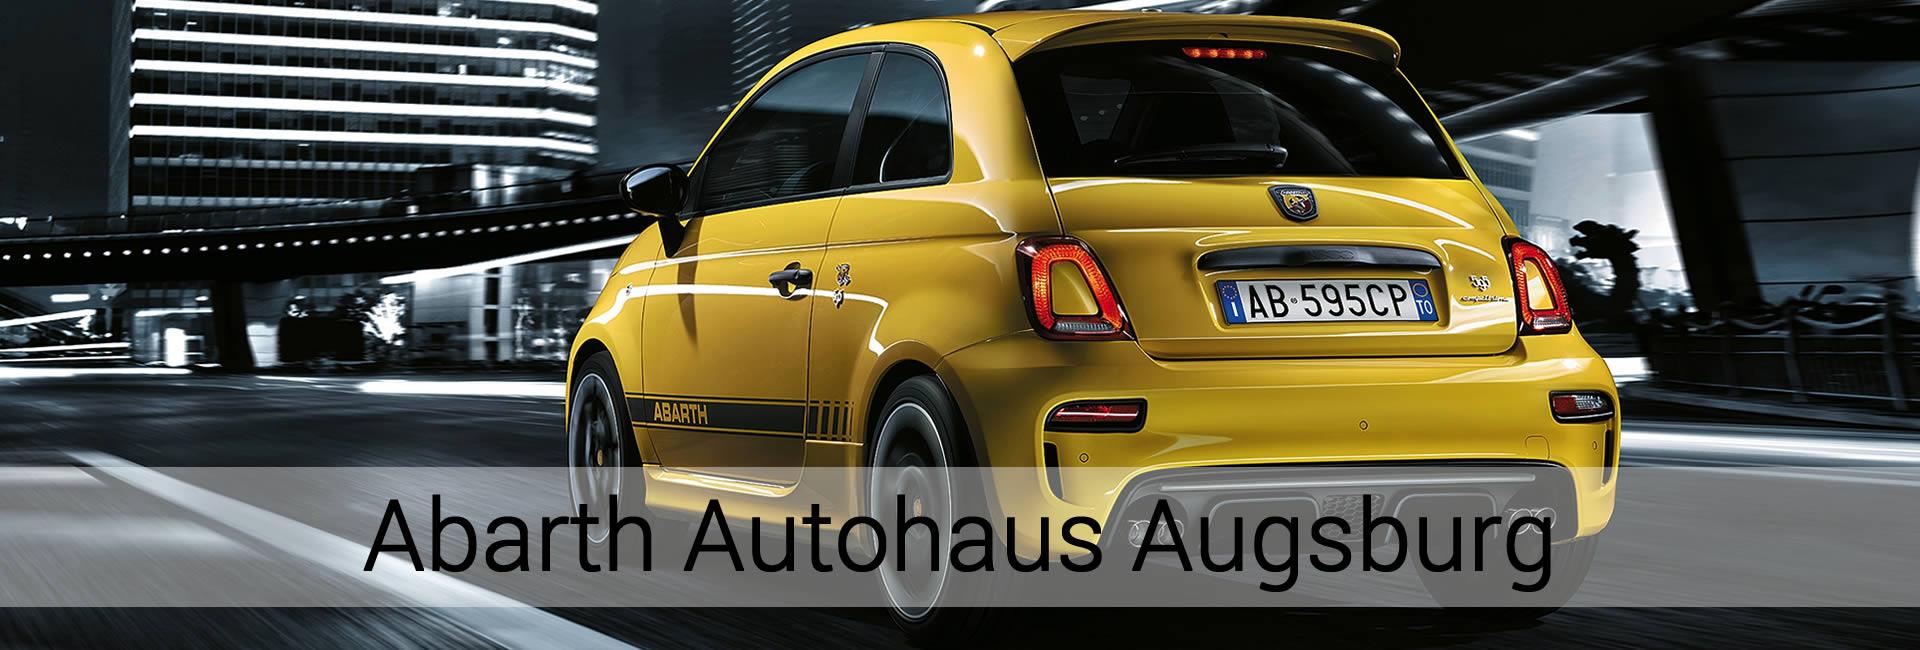 Abarth Autohaus Augsburg